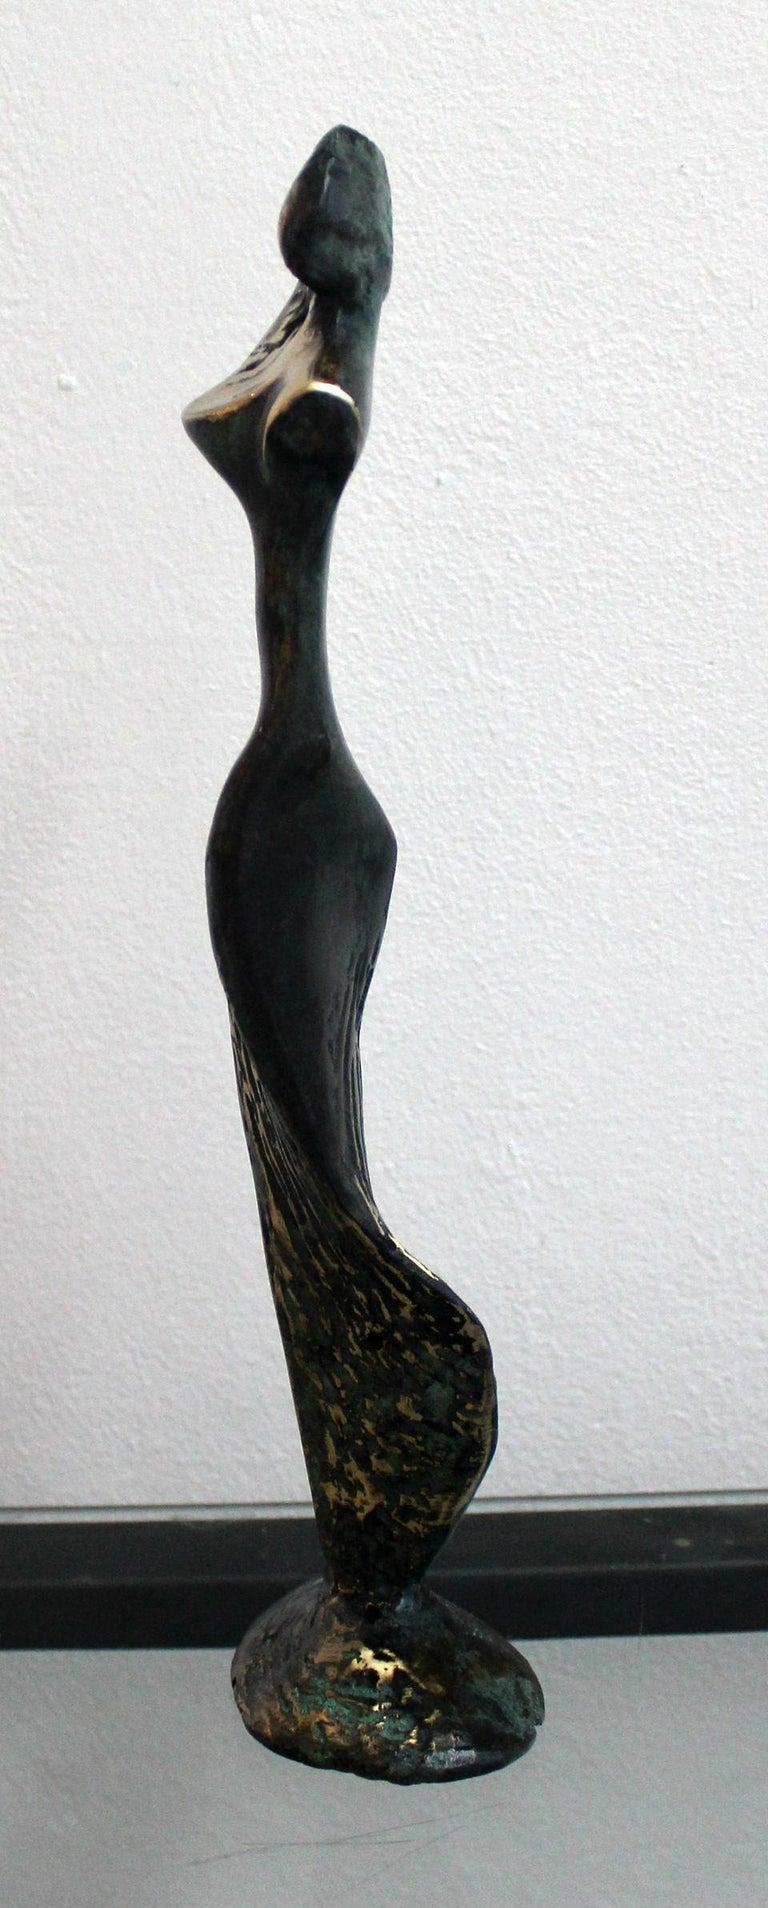 Venus - XXI Century, Contemporary Bronze Sculpture, Abstract, Figurative, Nude - Gold Figurative Sculpture by Stanisław Wysocki